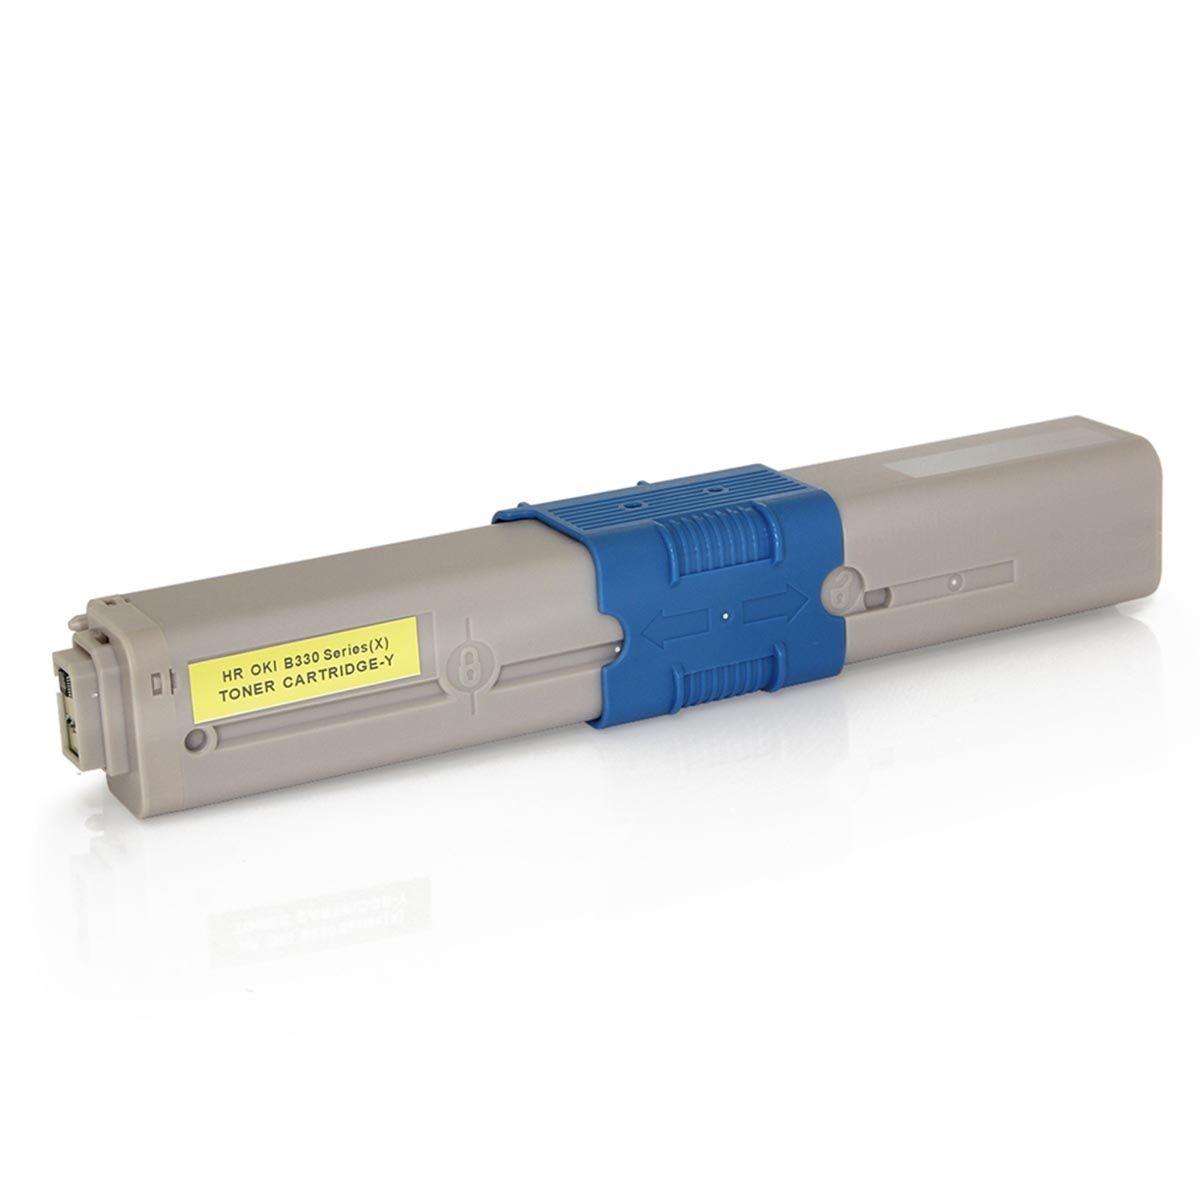 CARTUCHO DE TONER OKIDATA (469704/469701) C310/MC351/C310N/MC361DN/C330/MC561 AMARELO (COMPATÍVEL)